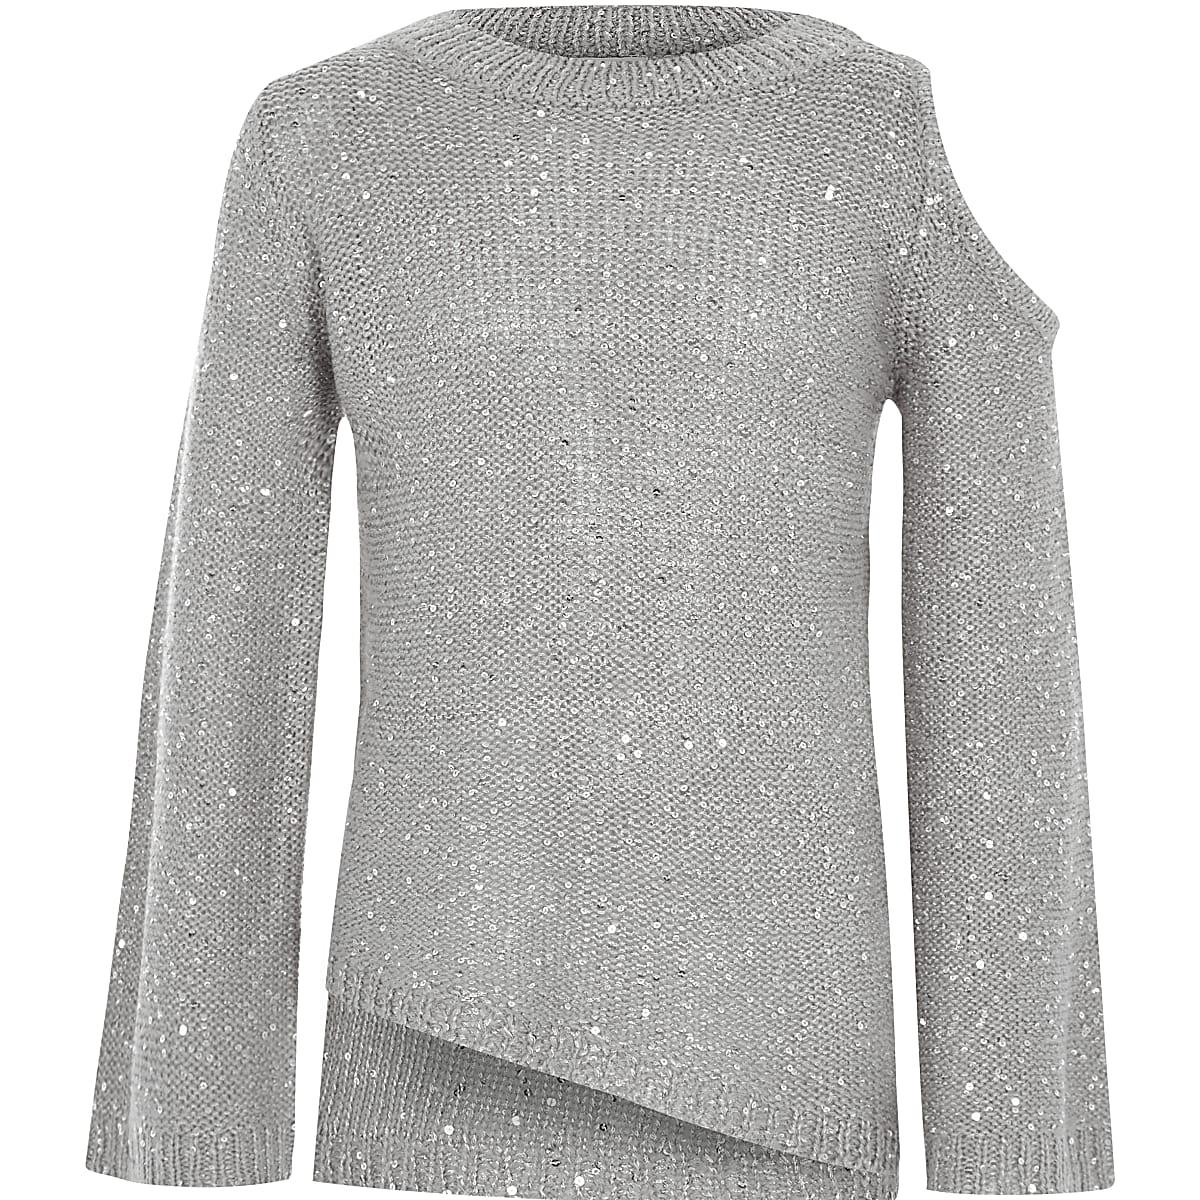 Girls grey sequin cold shoulder sweater